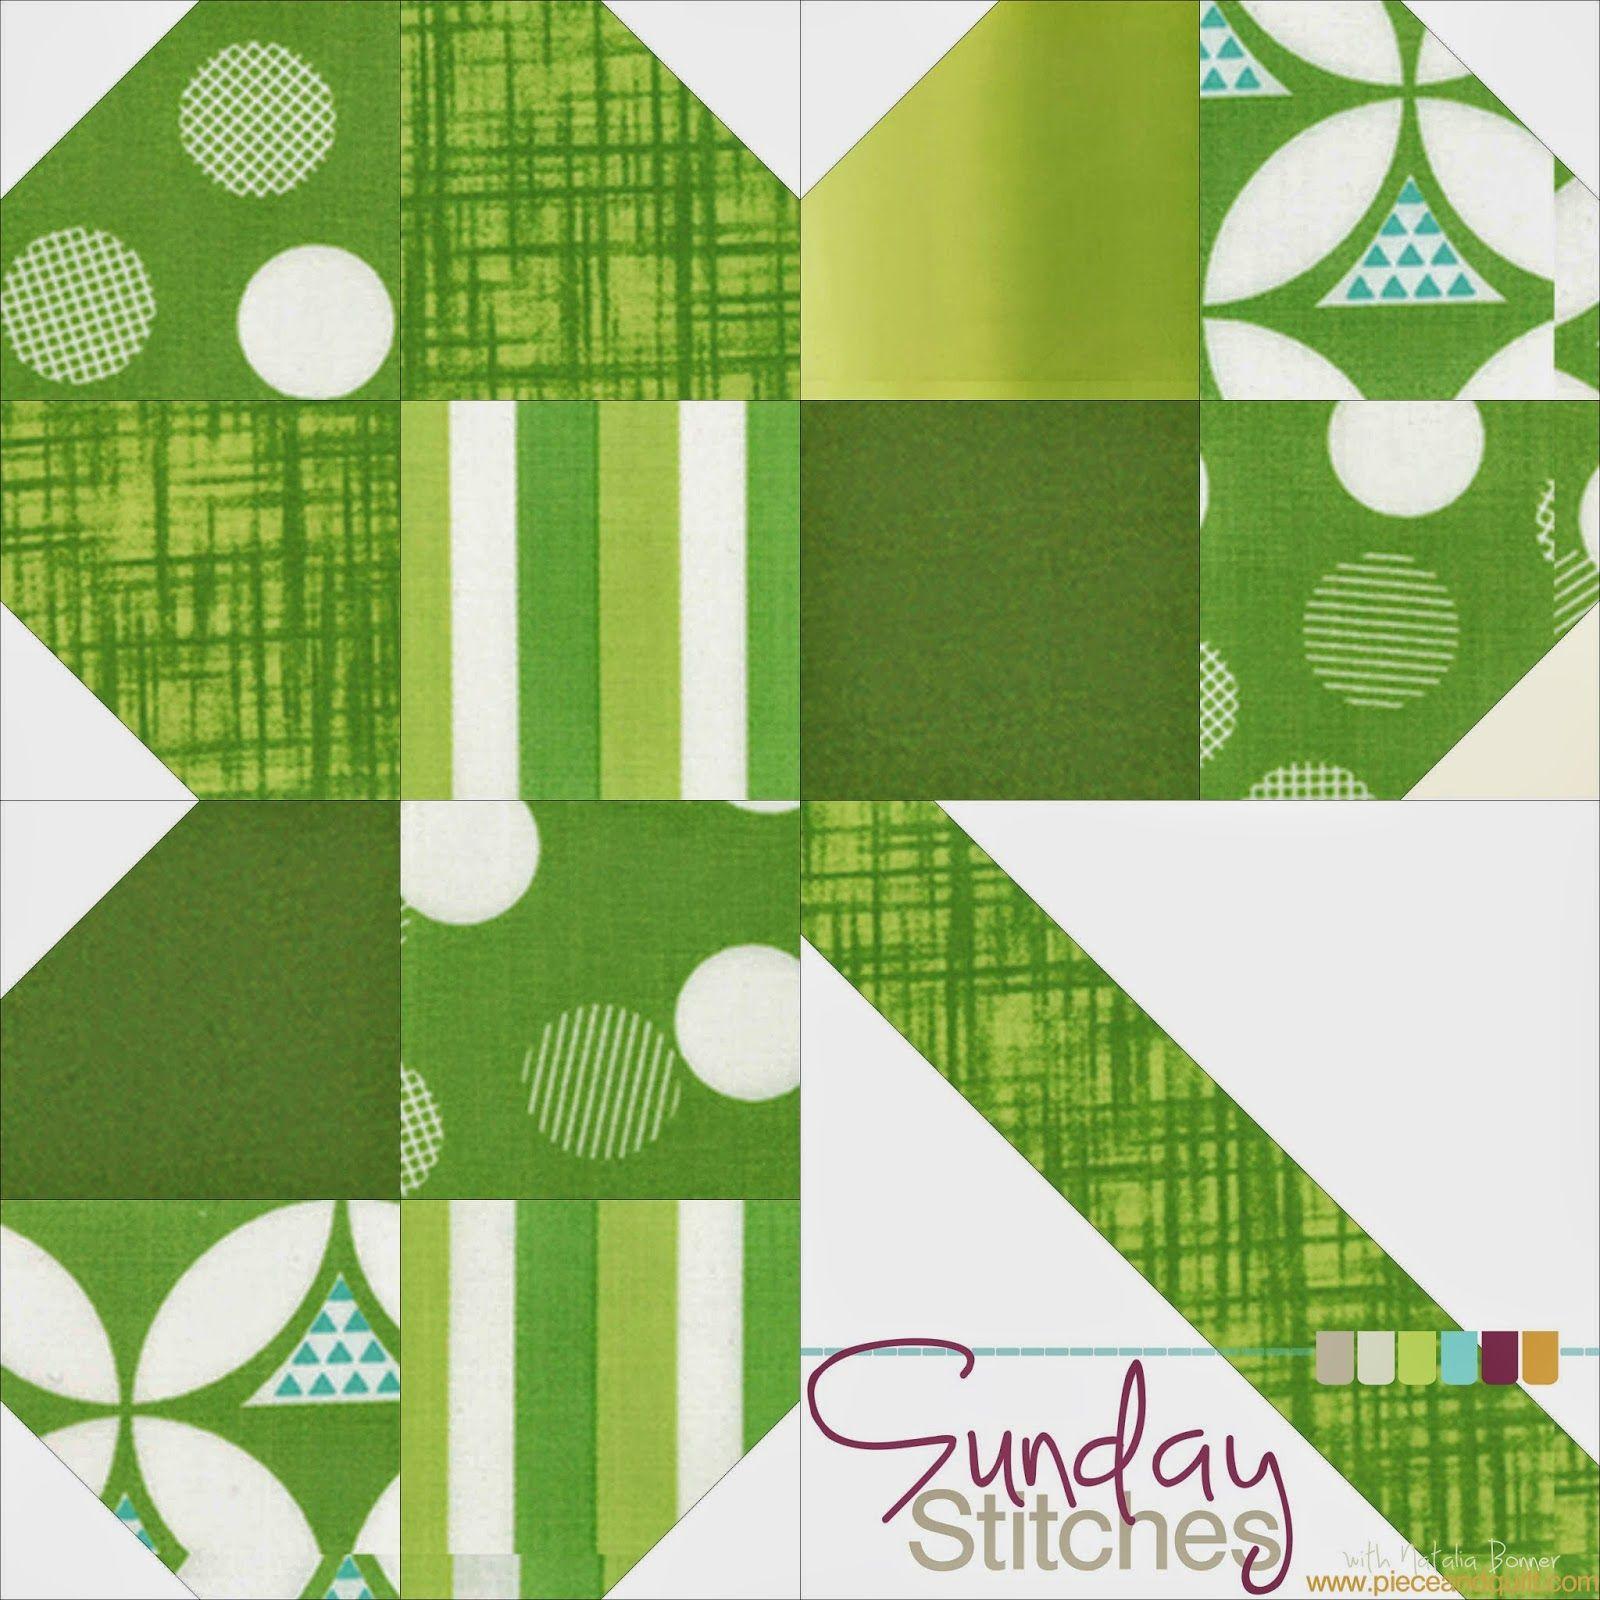 Piece N Quilt: How to: Clover Quilt Block Tutorial - Sunday ... : clover quilting - Adamdwight.com